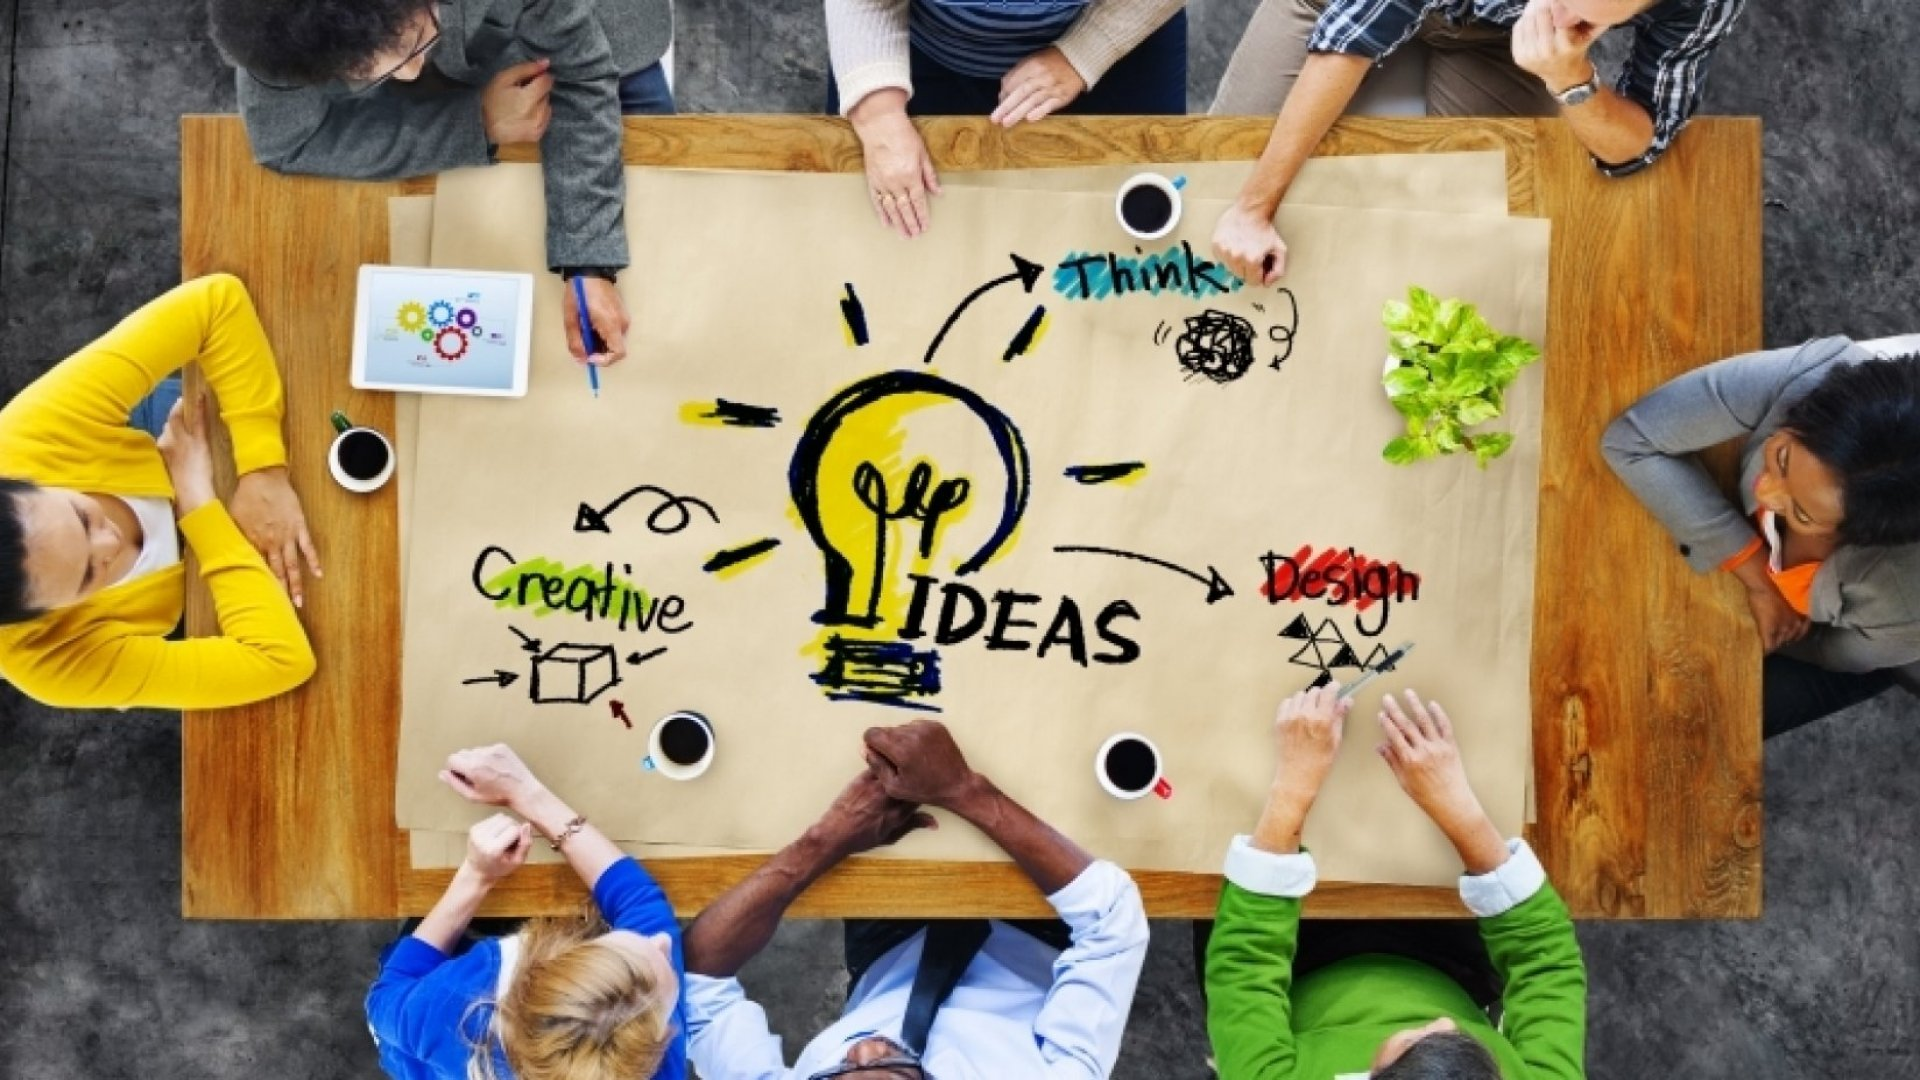 5 Ways to Transform Brilliant Creative Ideas Into Reality